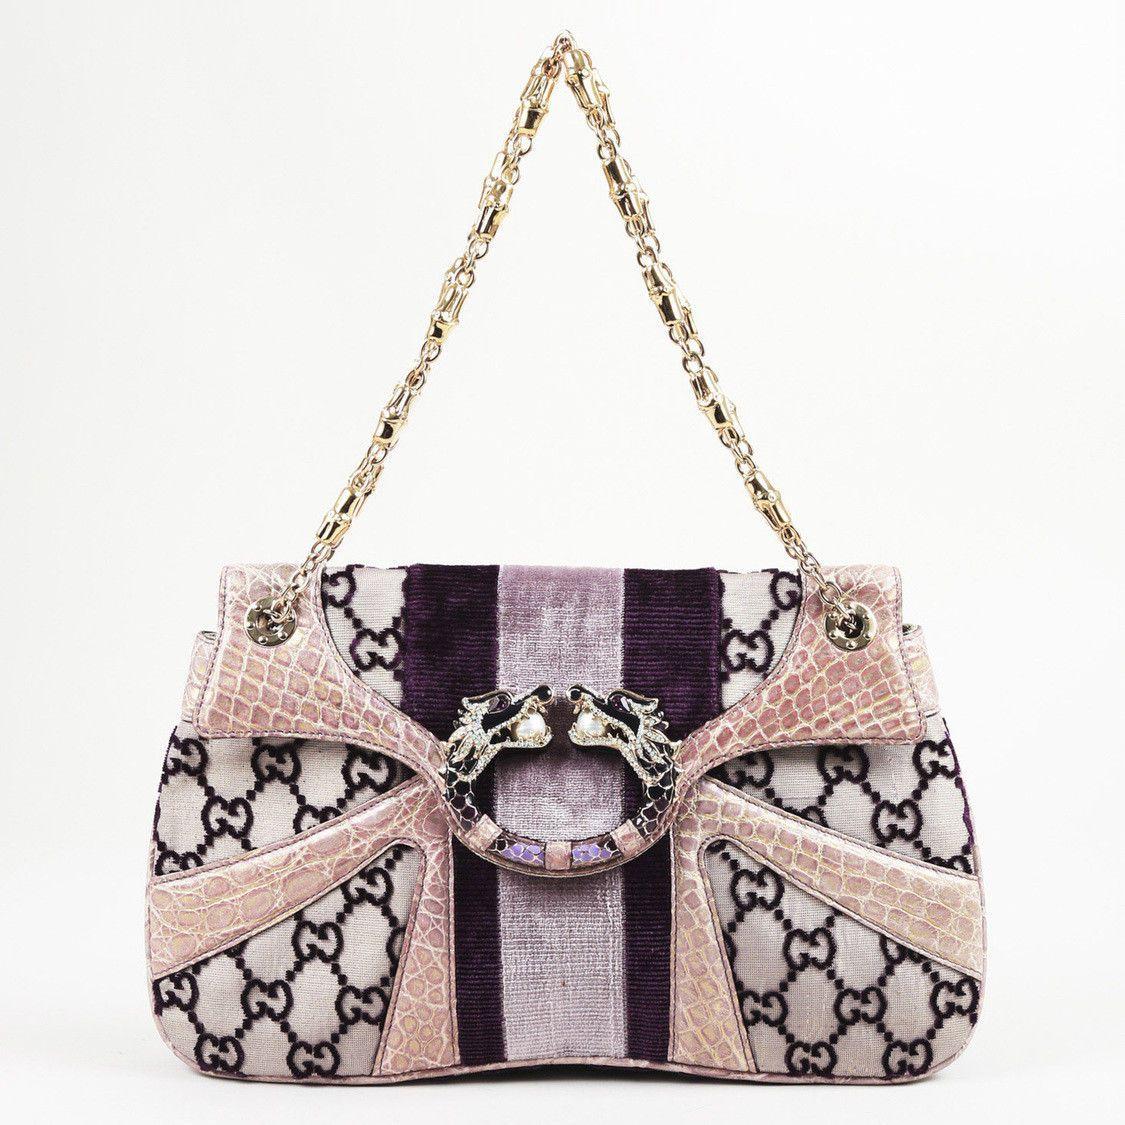 2a46325c6a3 Gucci Limited Edition Monogram Velvet Snakeskin Dragon Bag